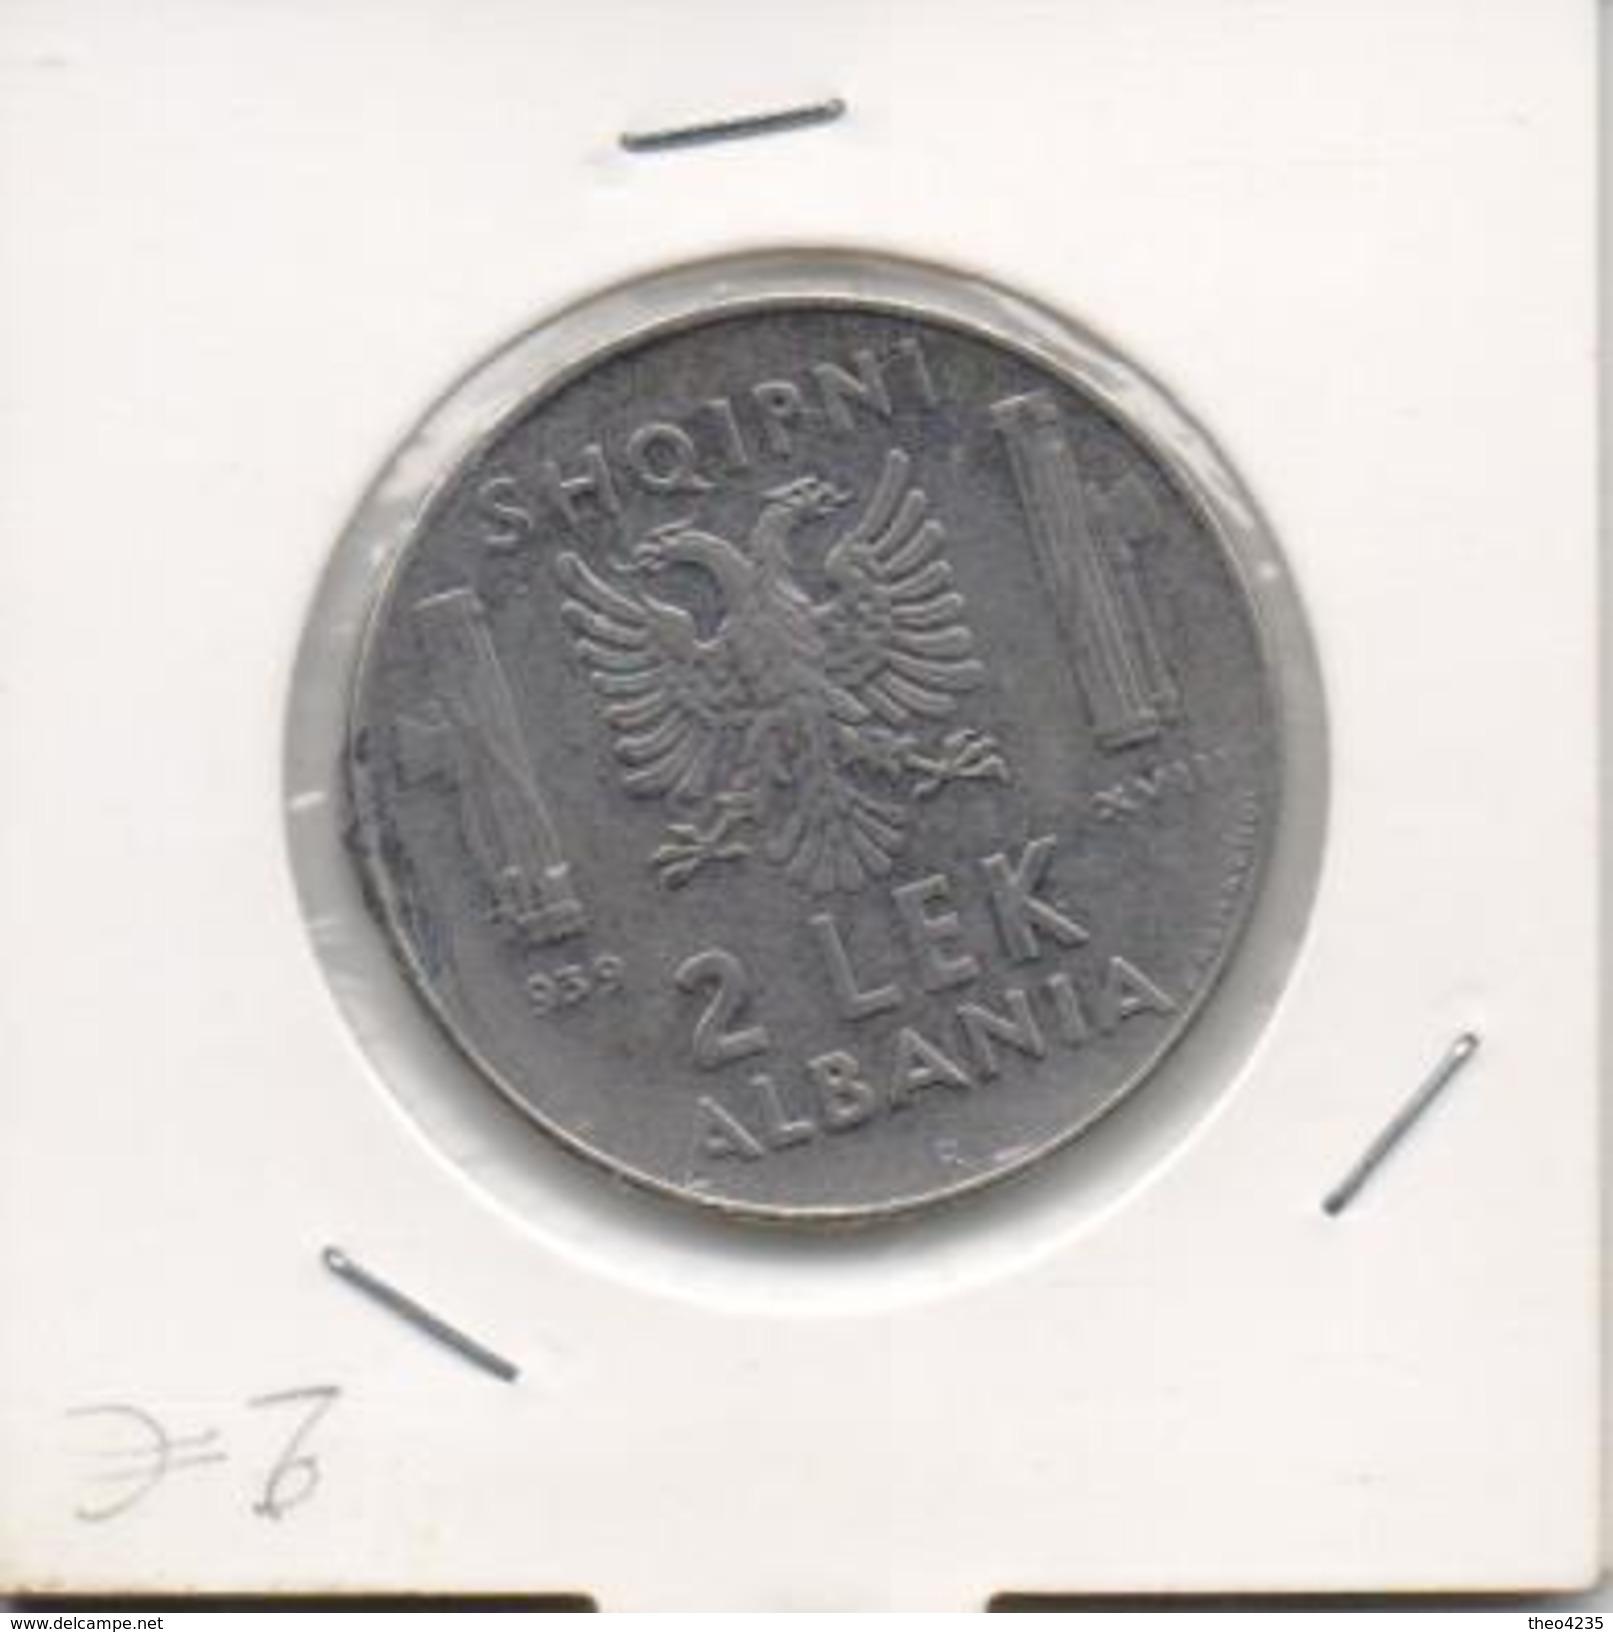 ALBANIA COIN 2 LEK 1939(italian Occupation)- USED AS SCAN - Albanie